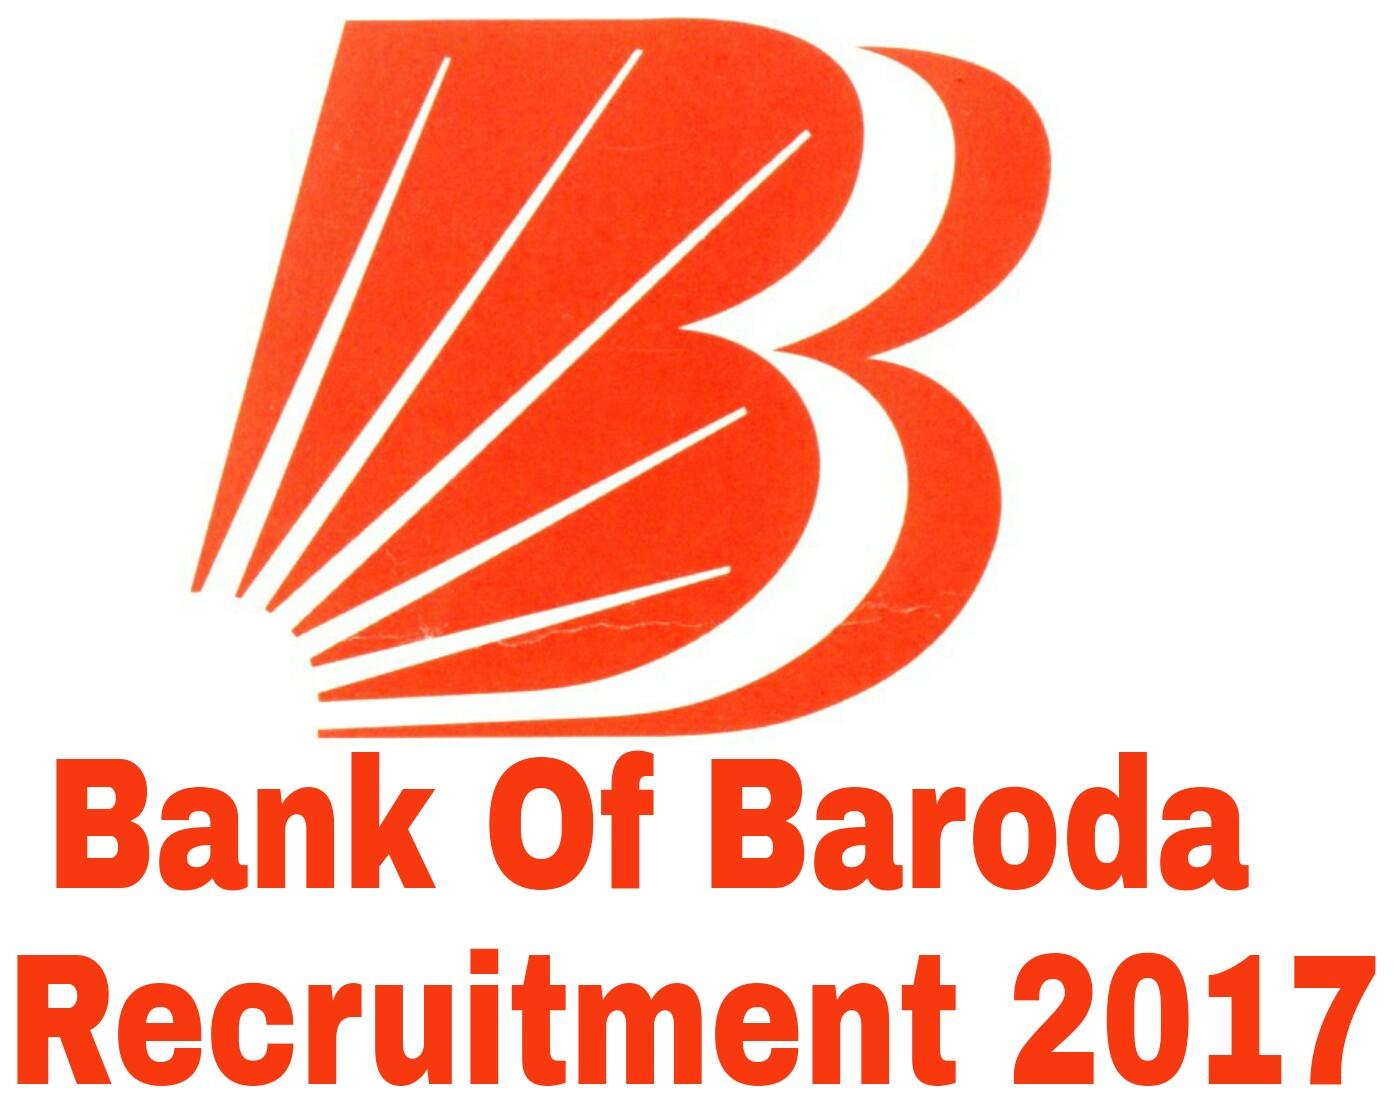 bank of baroda © 2008 bank of baroda all rights reserved barodaconnect service © 2008 bank of baroda all rights reserved.